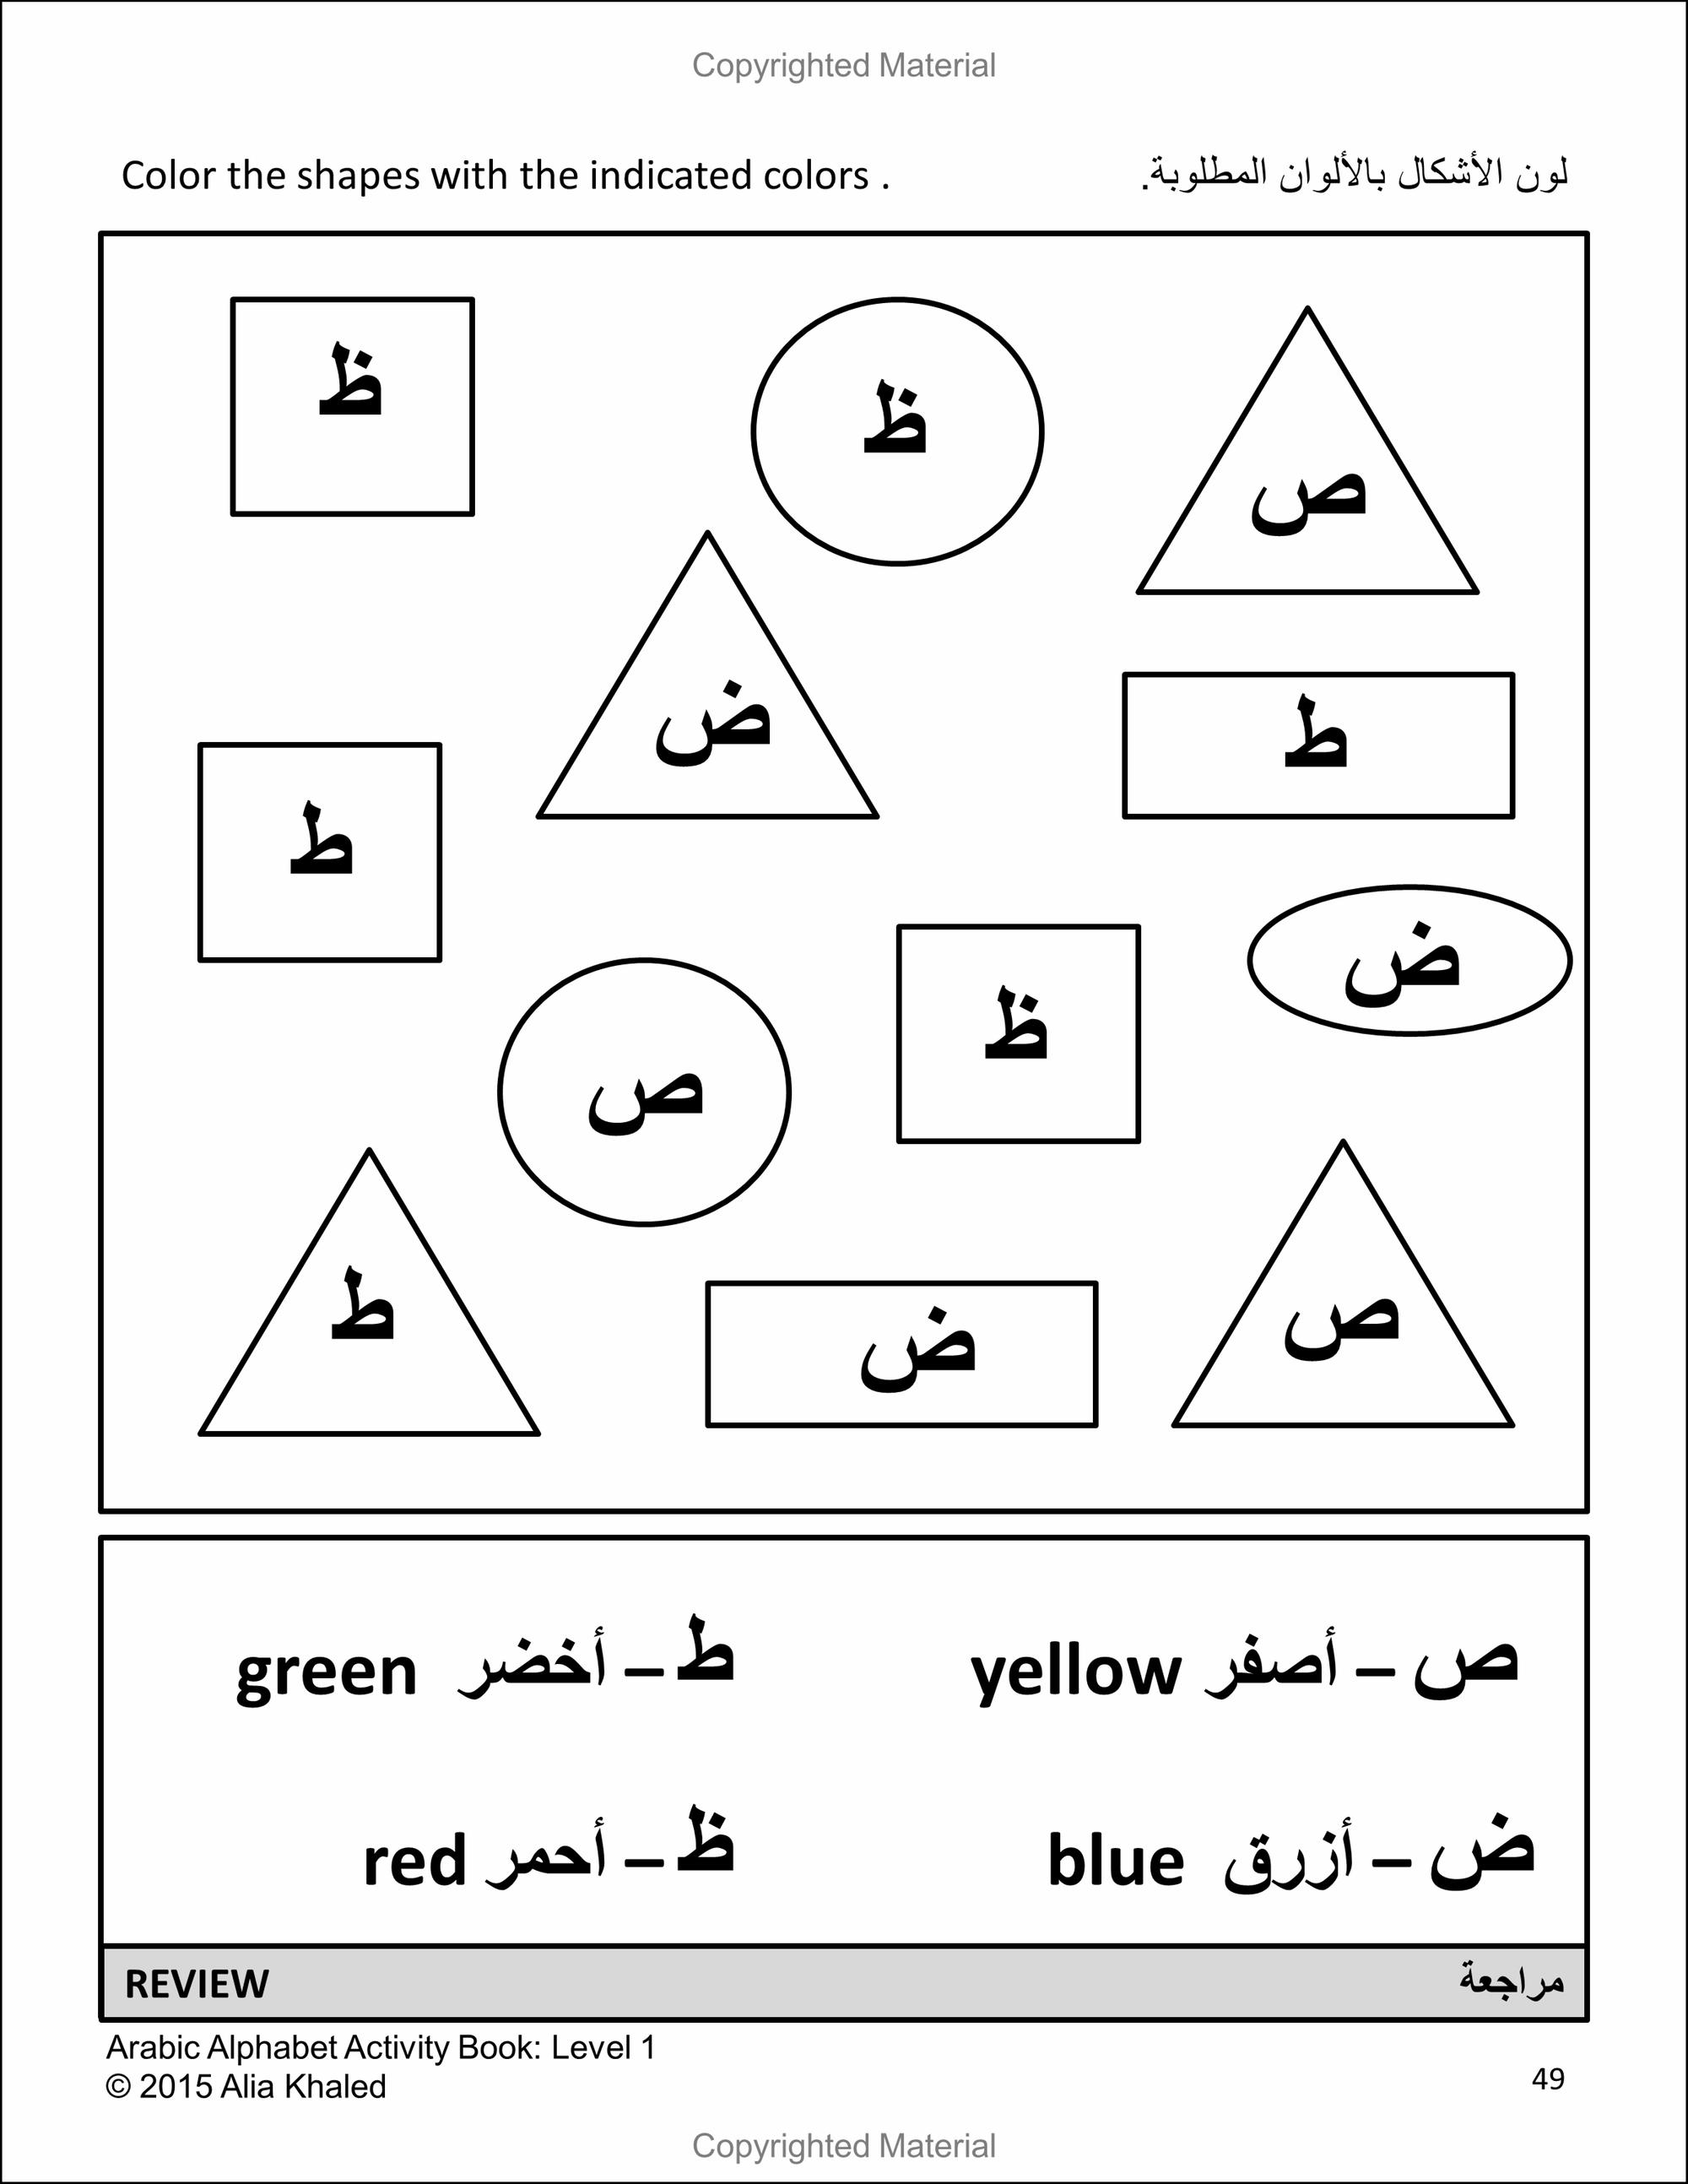 Image Of Arabic Alphabet Activity Book Level 1 Black